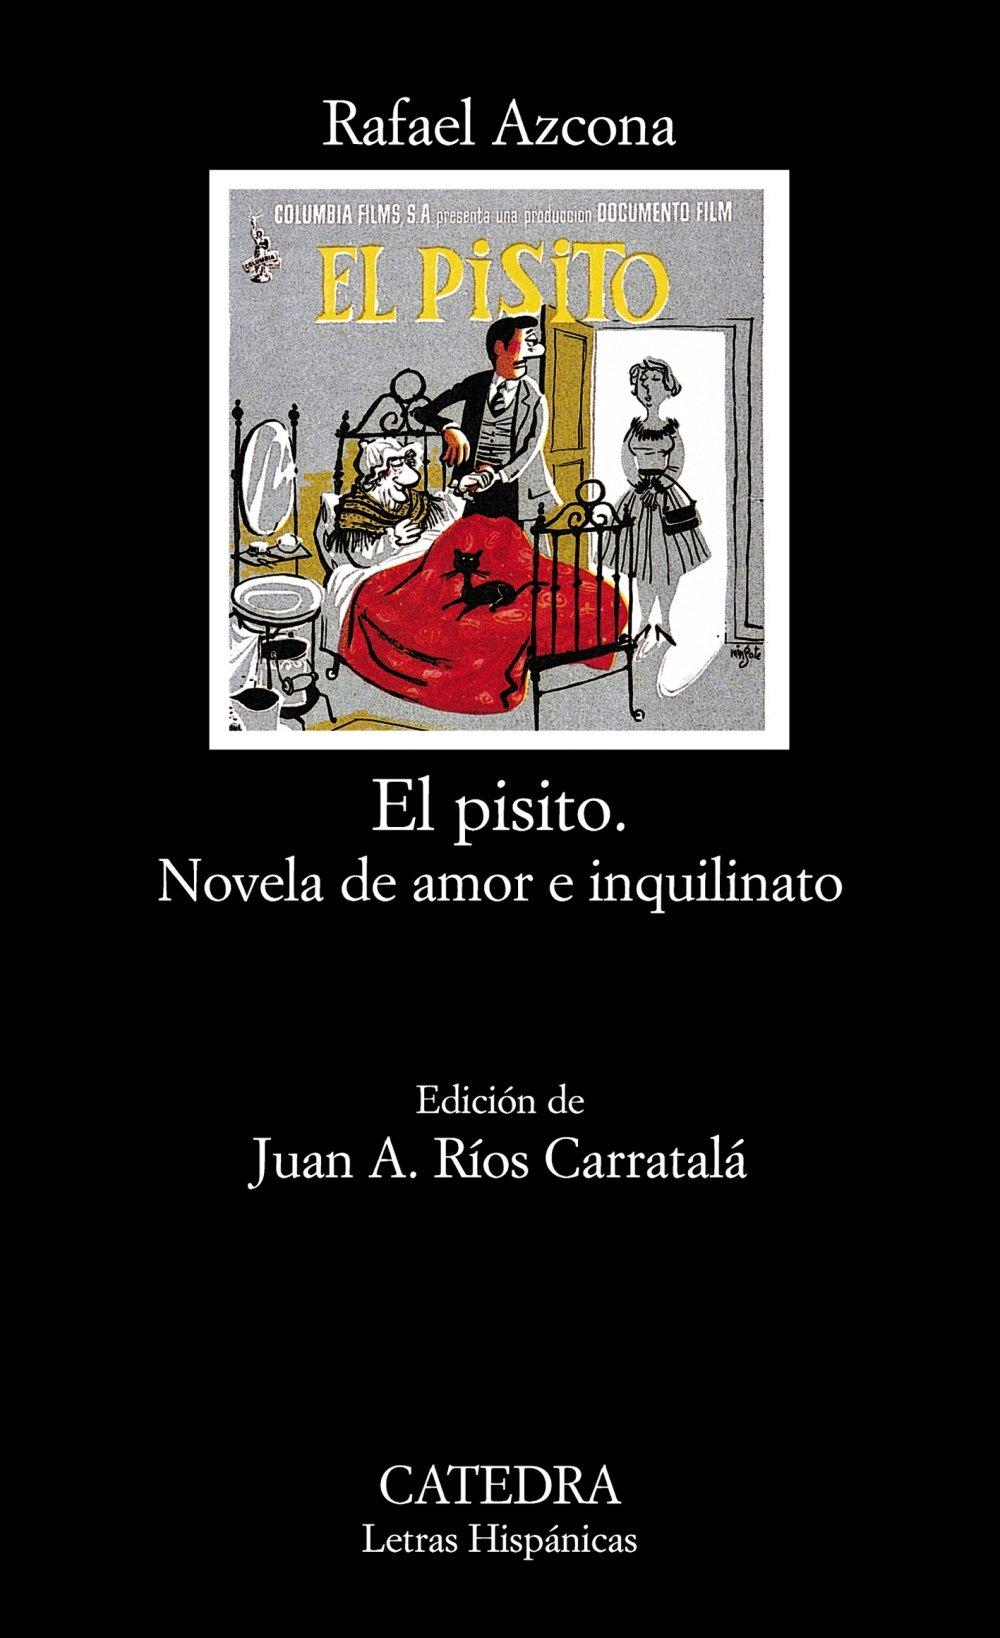 Download El pisito / The Flatlet: Novela de amor e inquilinato / Romance and Tenancy Story (Letras Hispanicas) (Spanish Edition) pdf